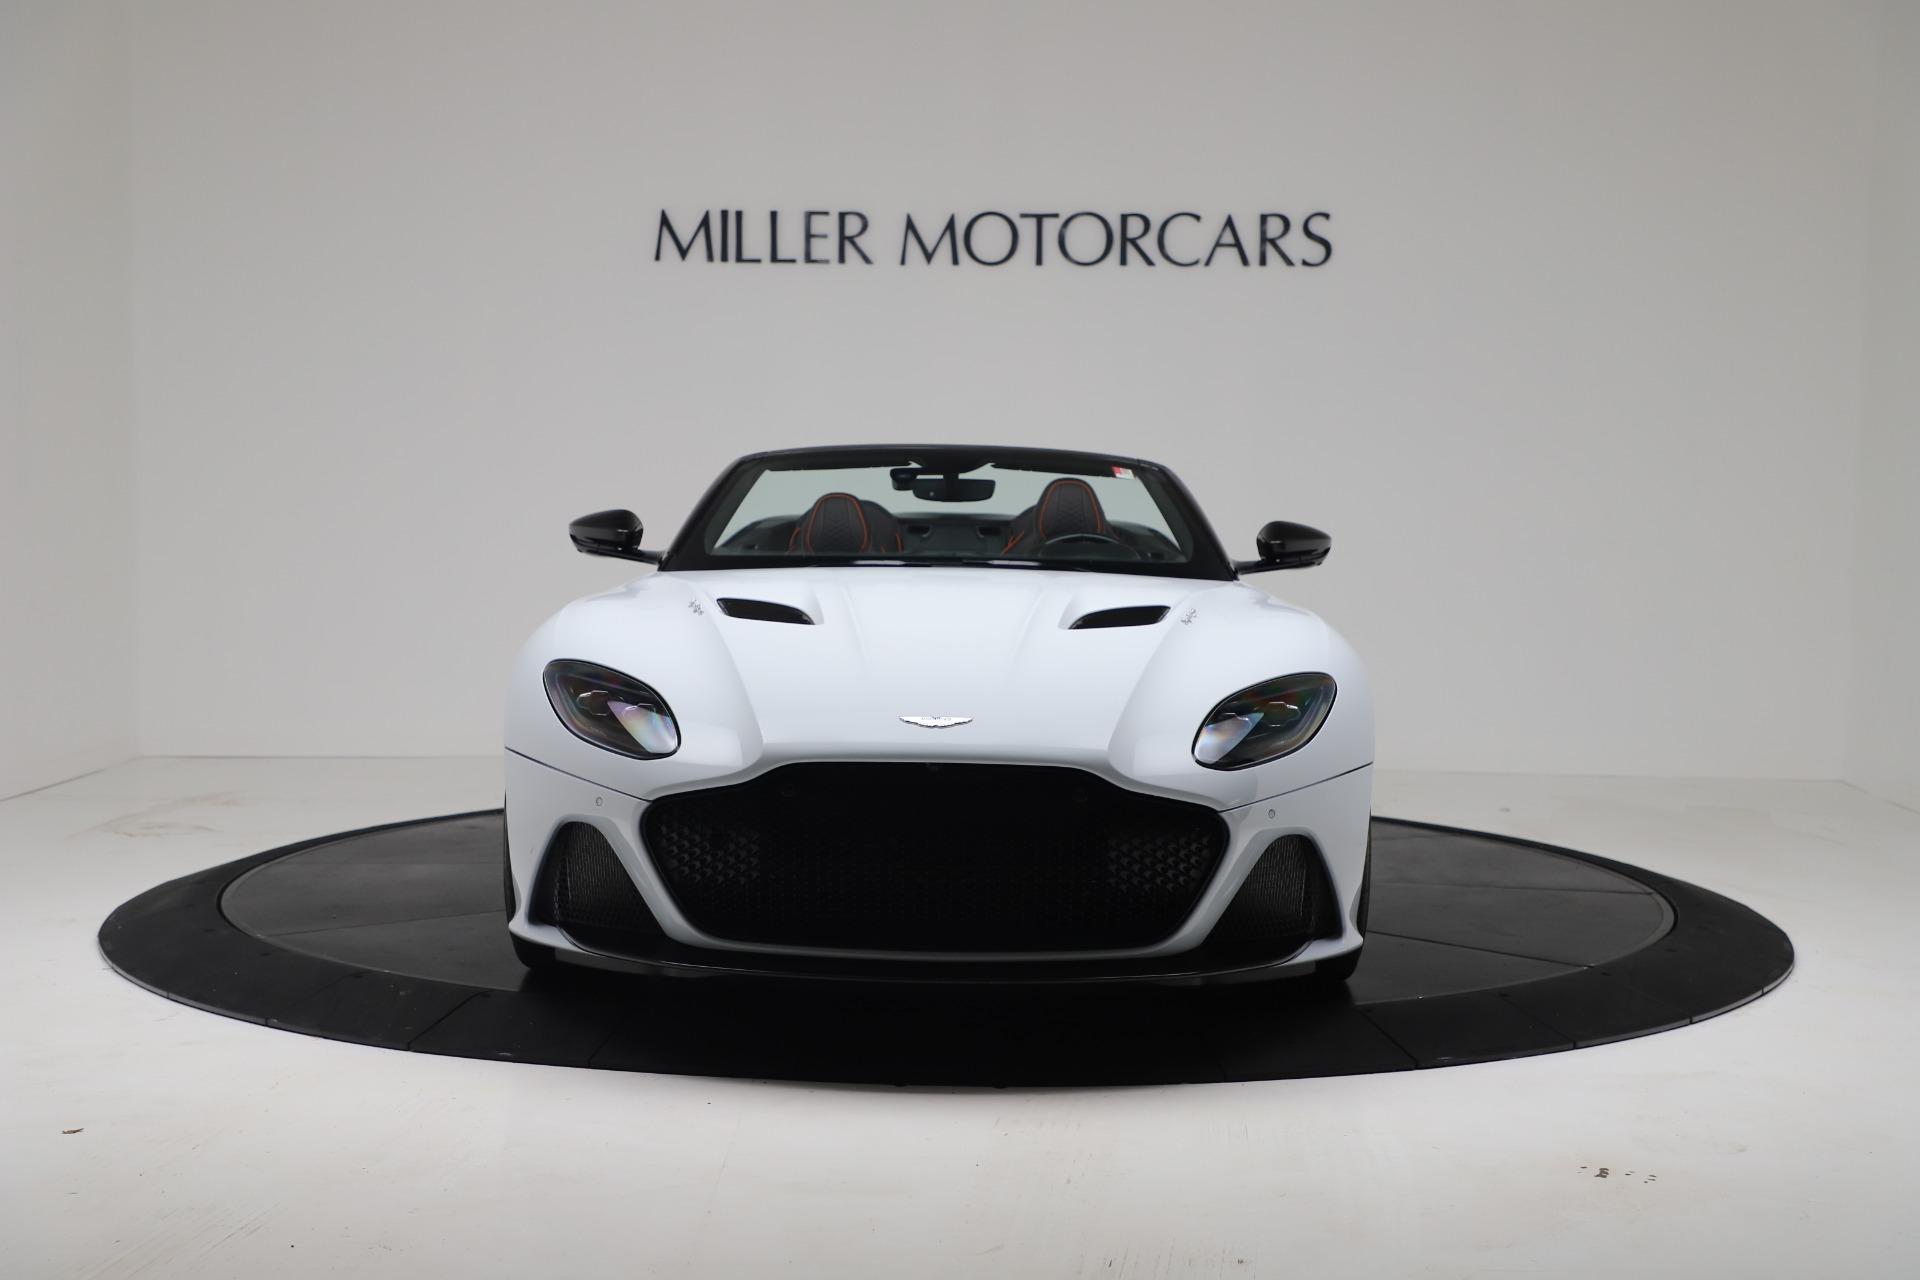 New 2020 Aston Martin DBS Superleggera Volante Convertible For Sale In Westport, CT 3484_p11